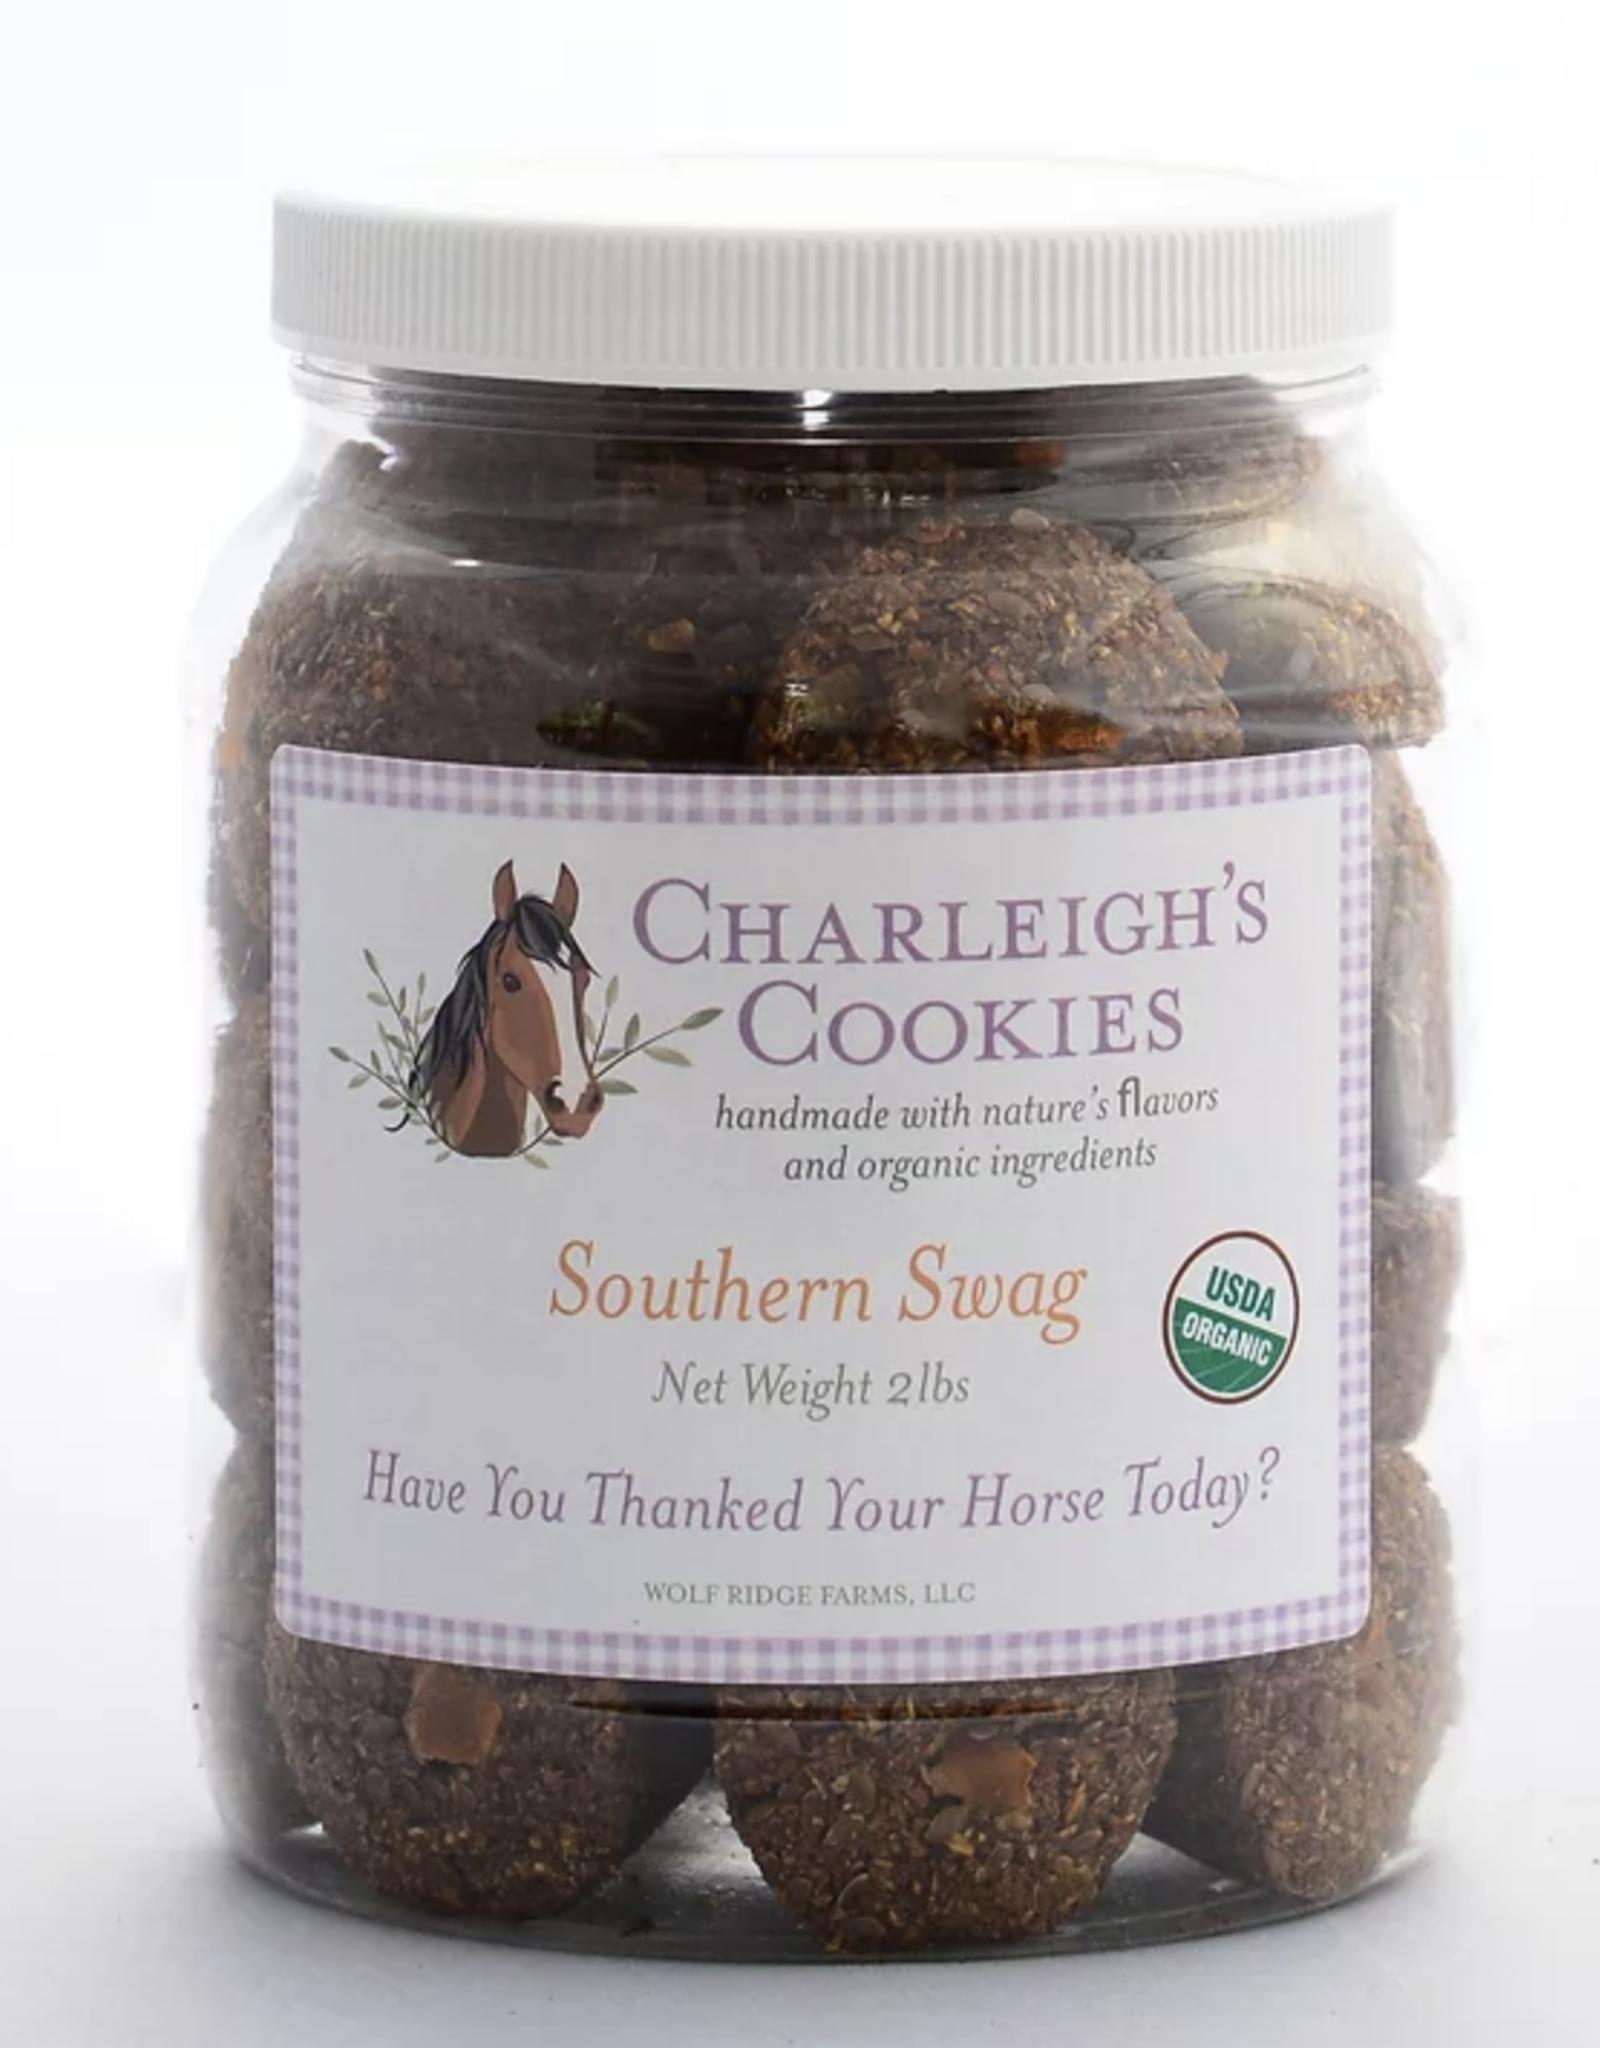 Charleigh's Cookies Charleigh's Cookies Southern Swag 2lb Cookie Jar